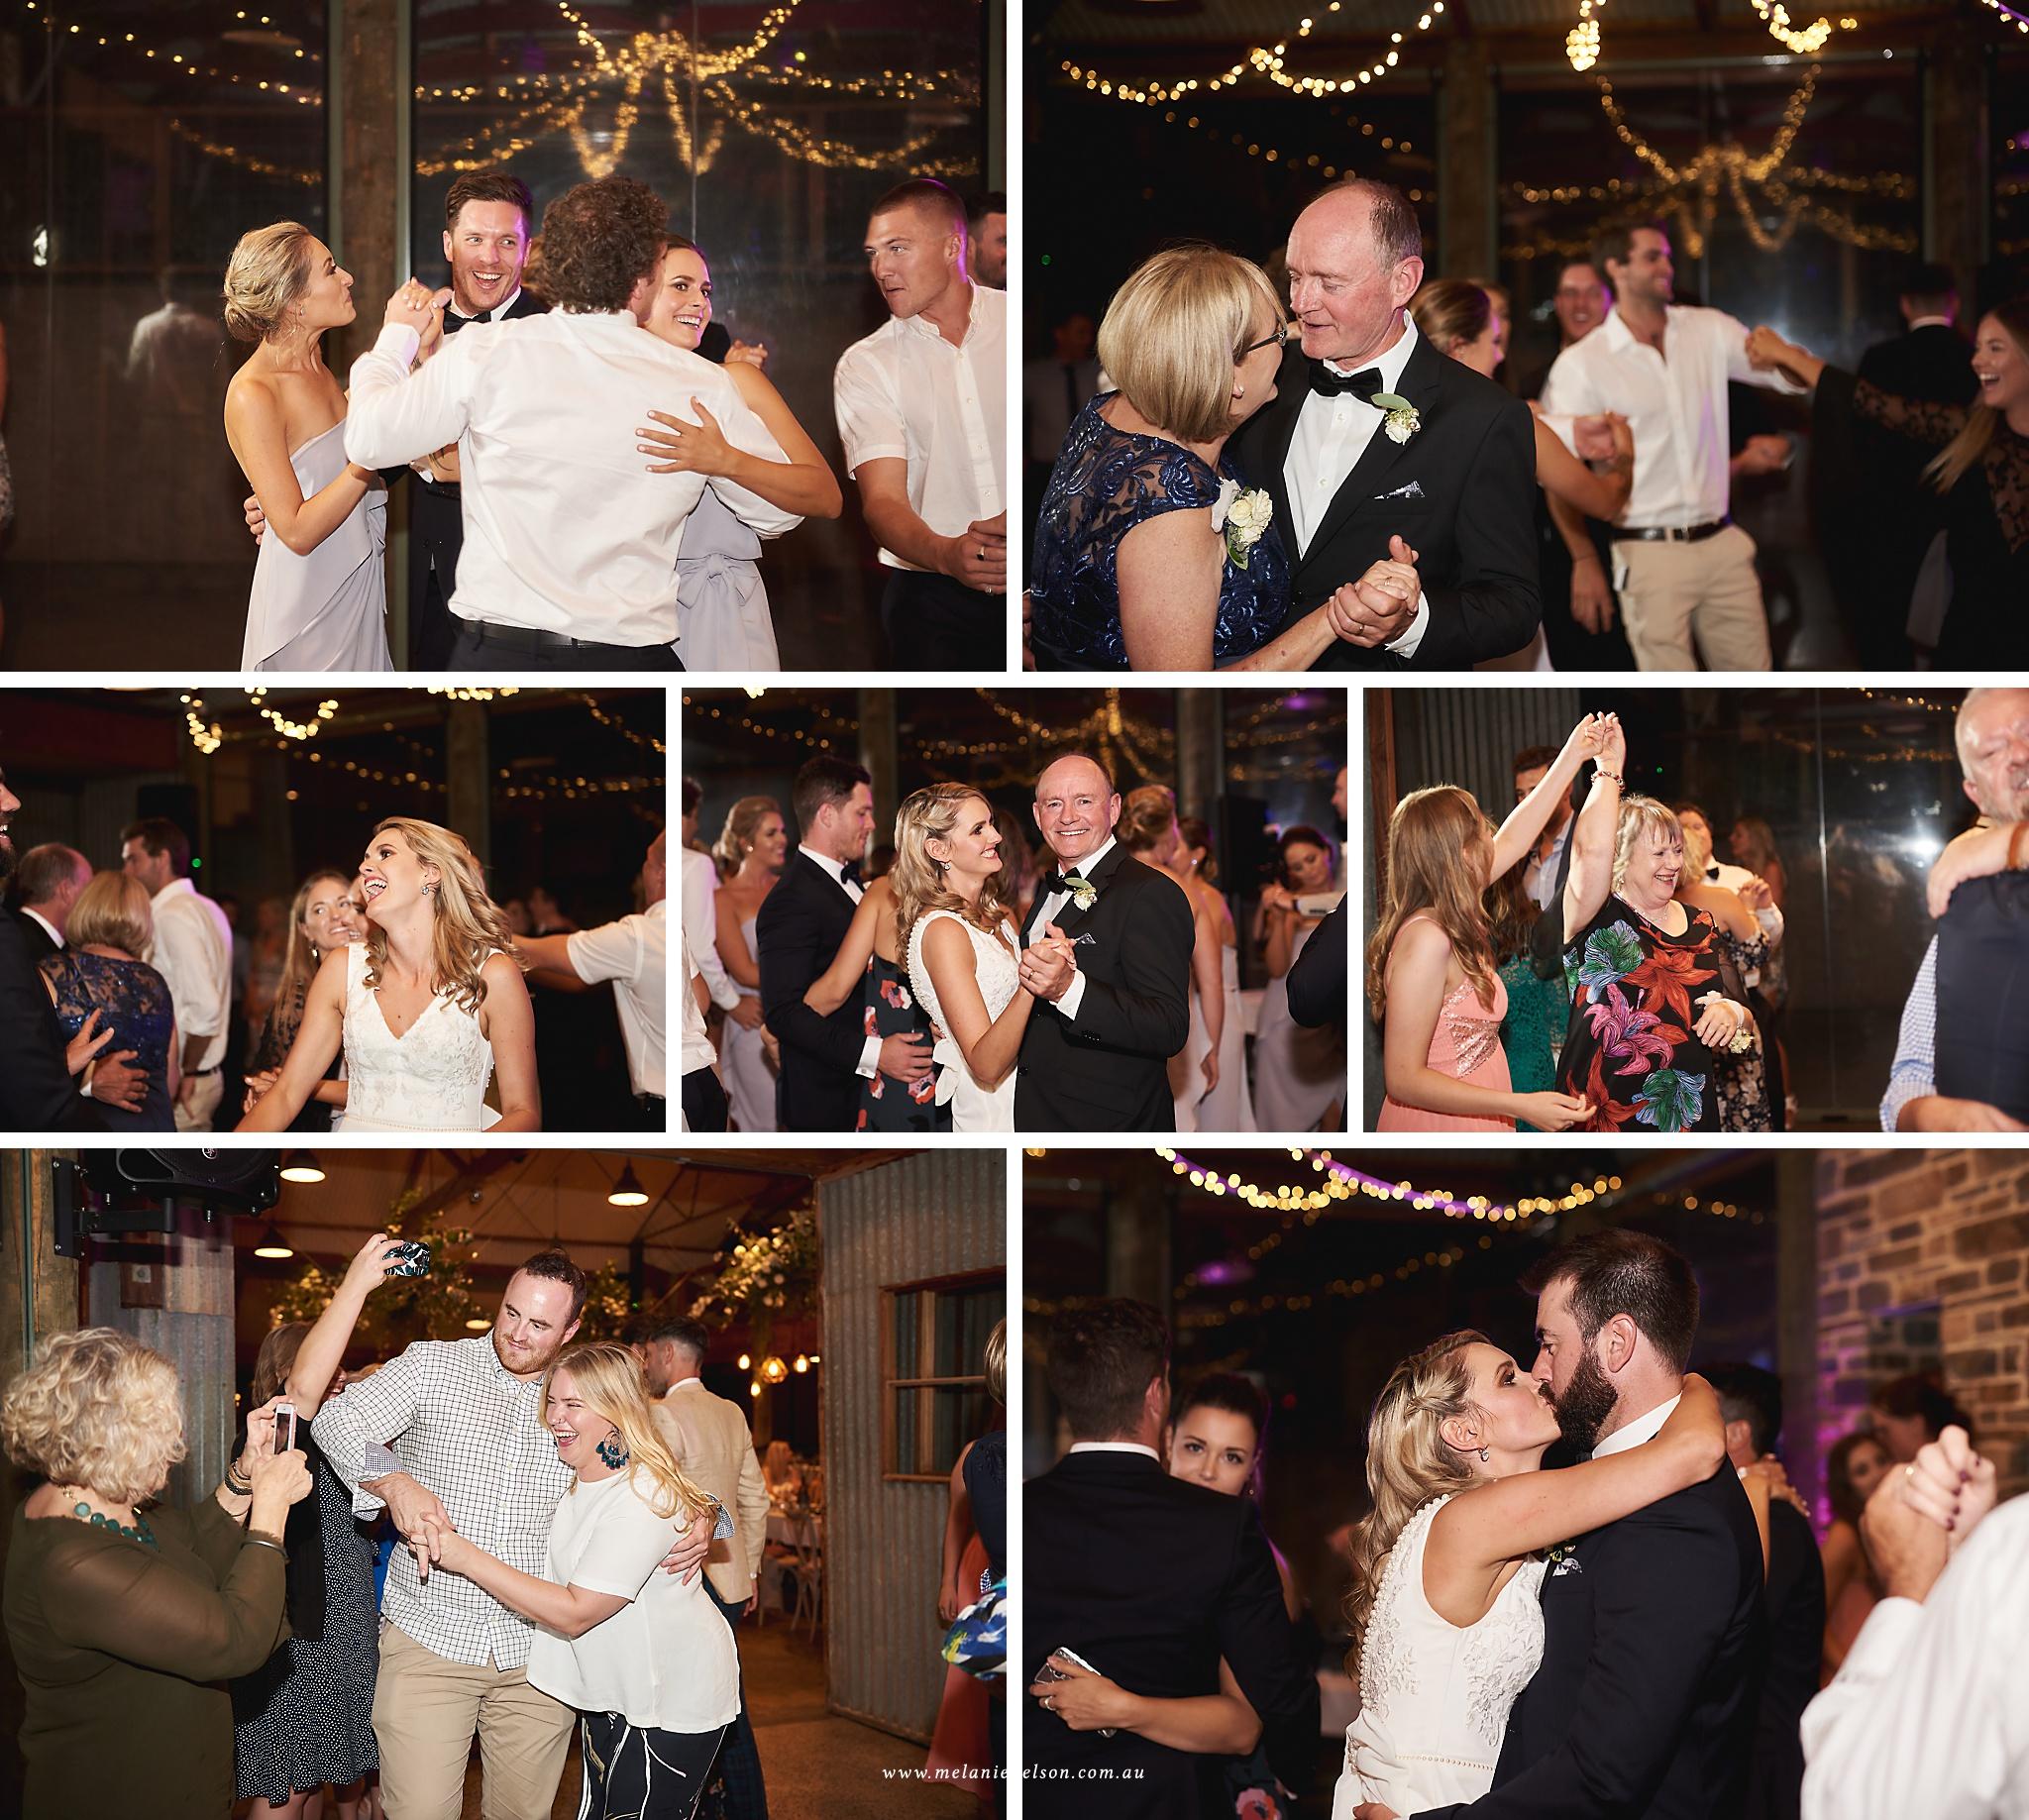 longview_vineyard_wedding_0094.jpg